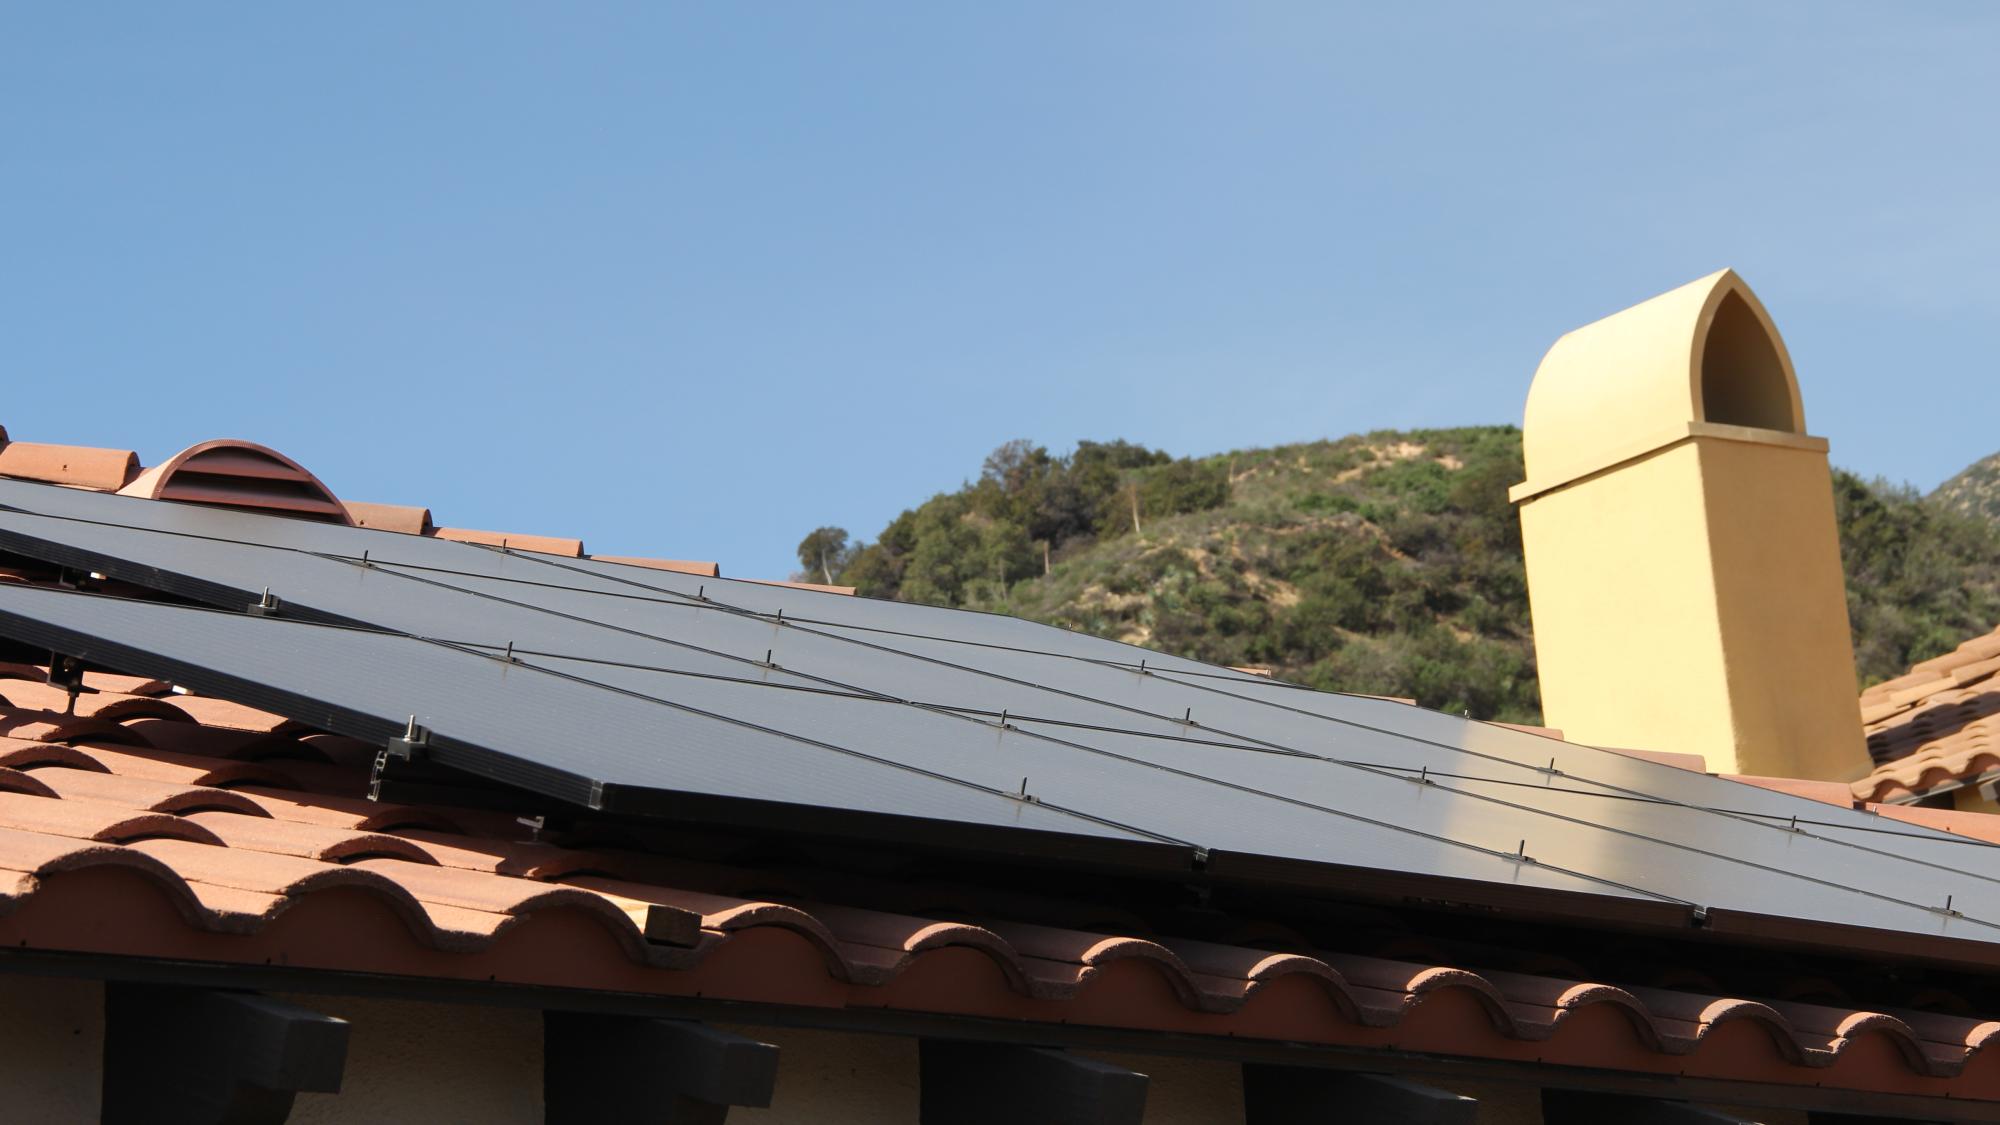 Better Looking Solar Panel